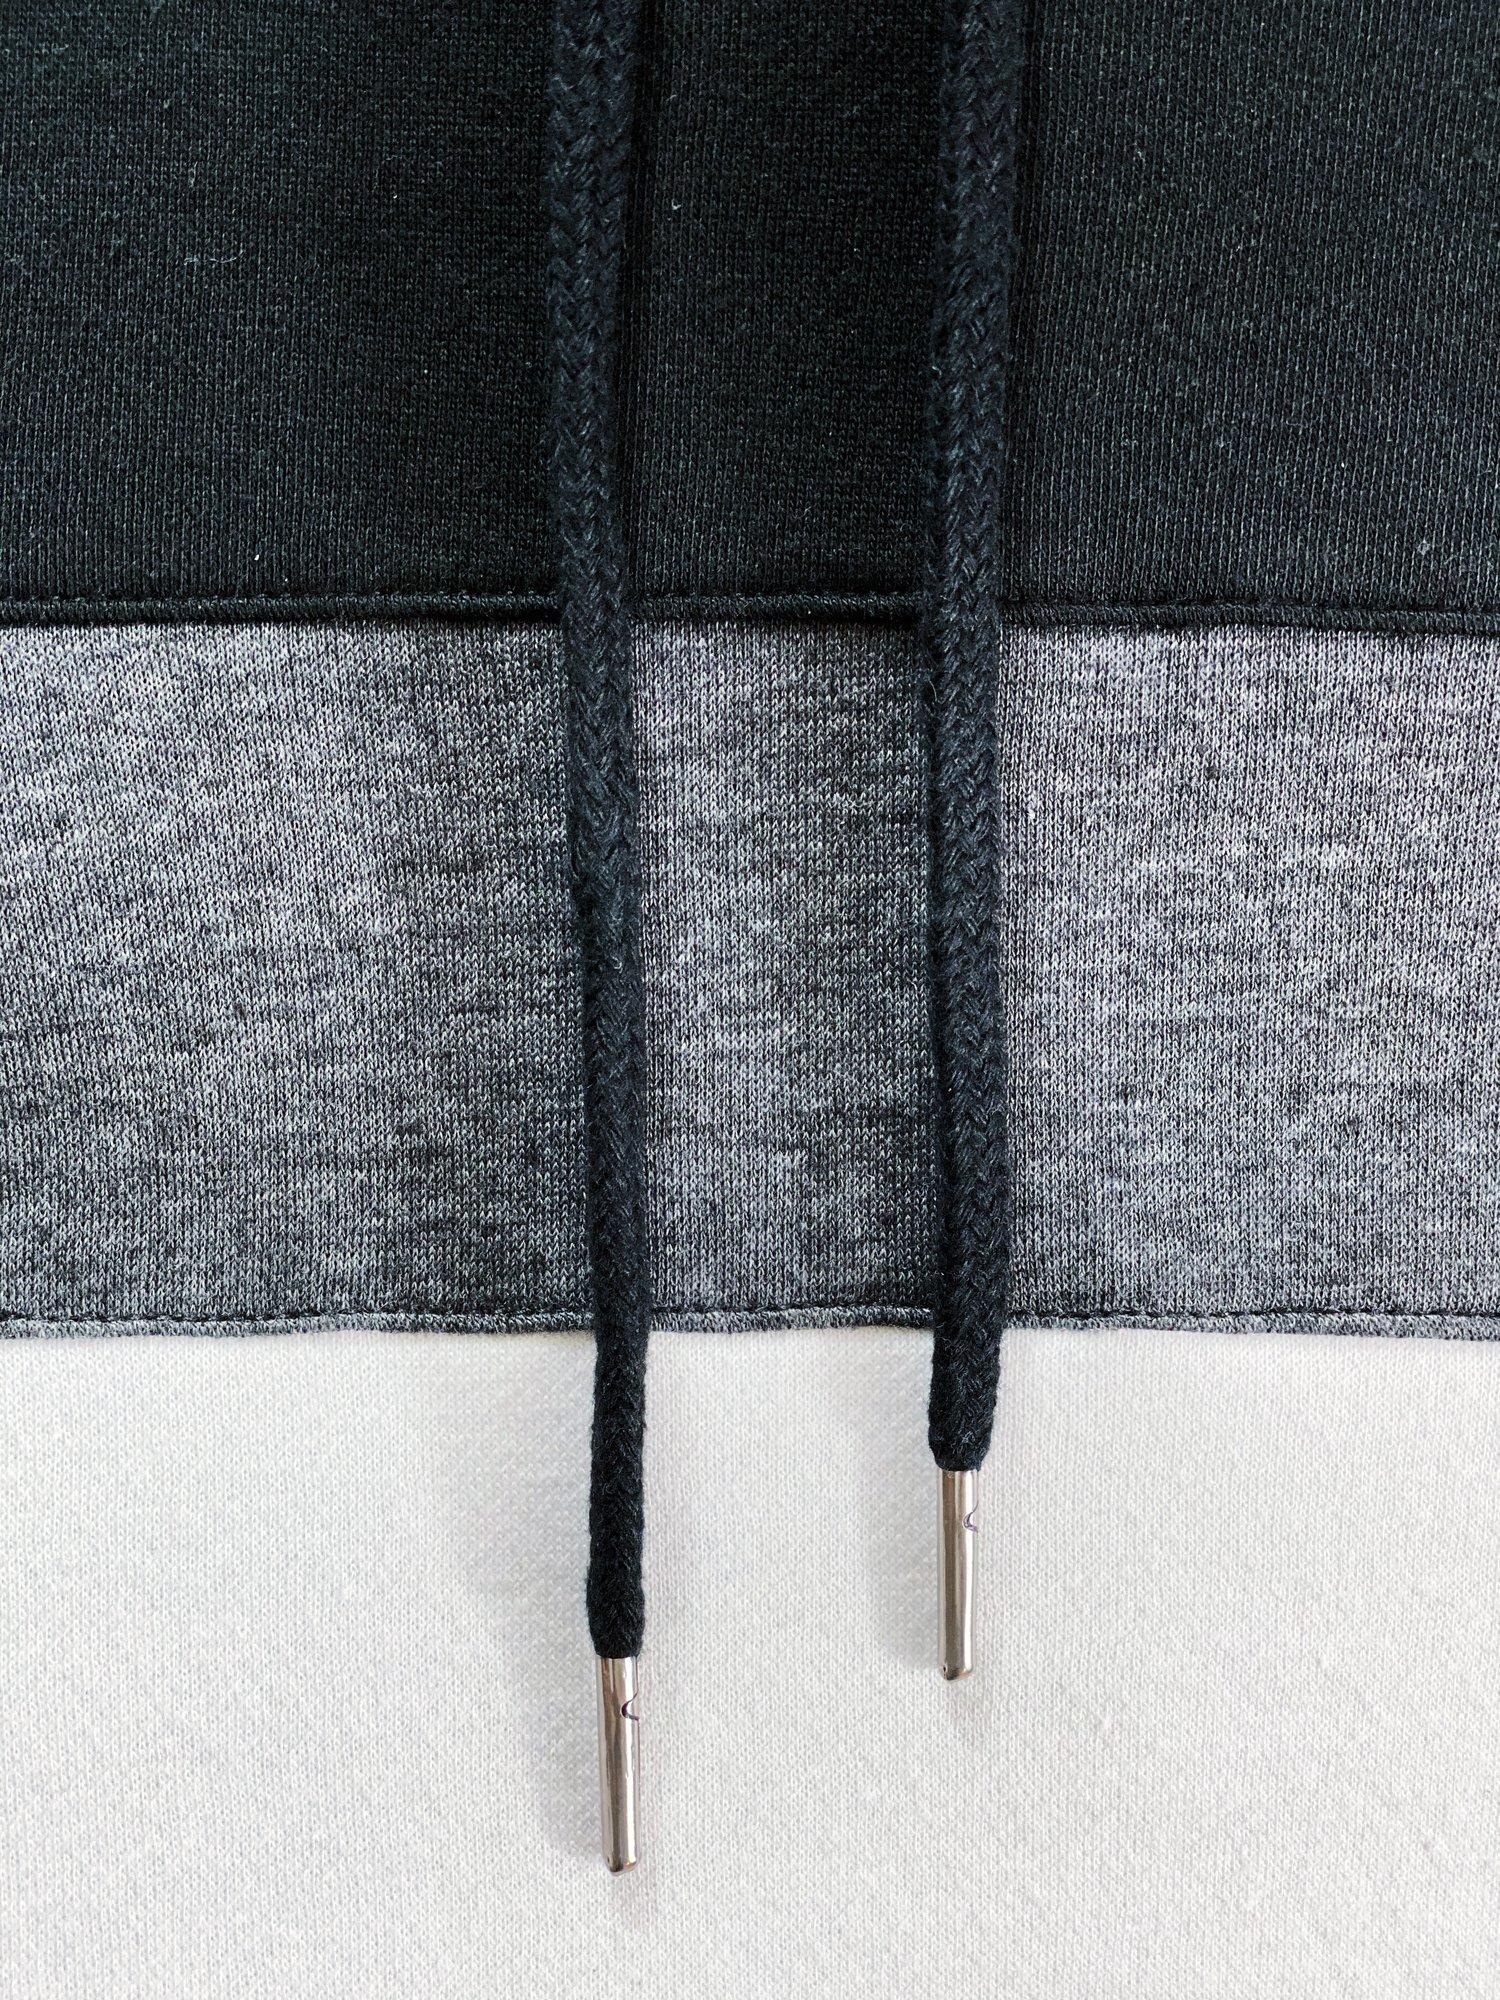 Image of Double Stripe Hoodie